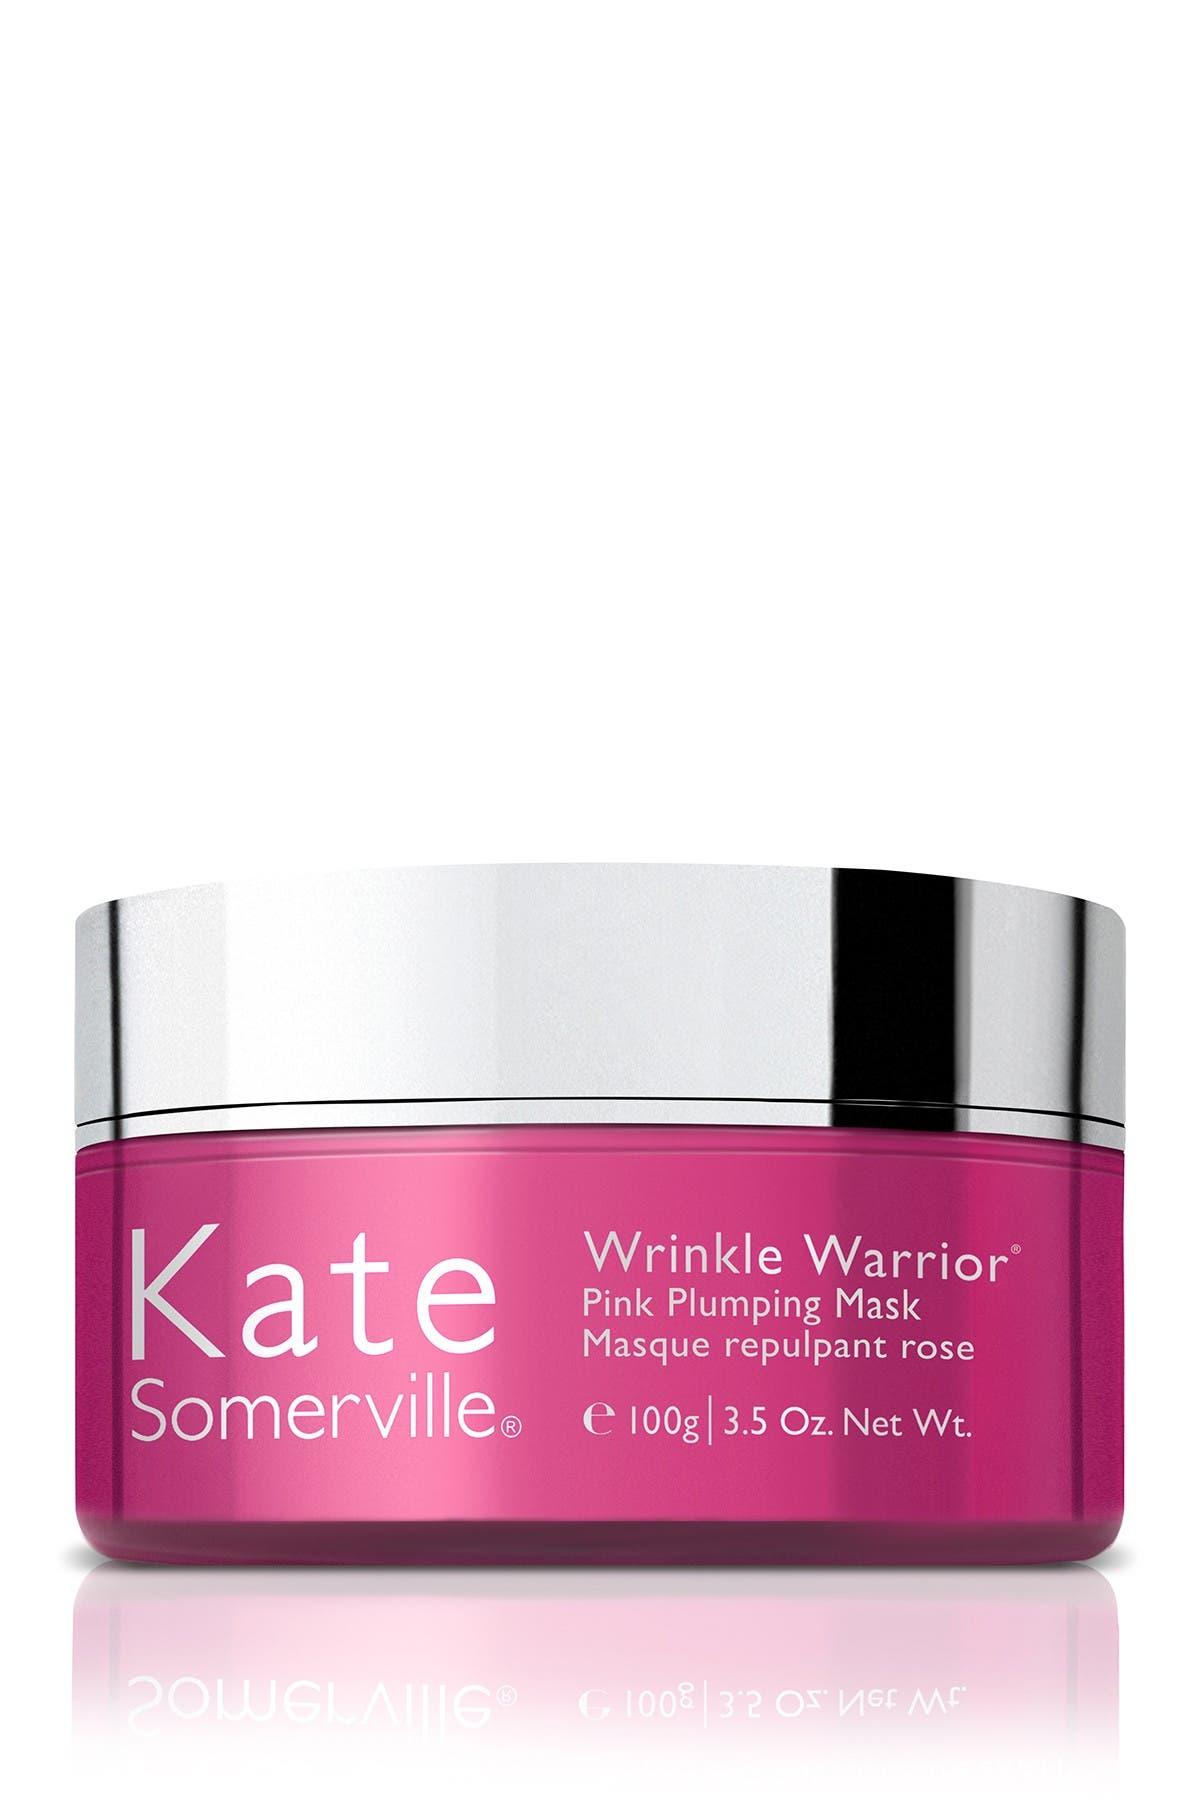 Image of Kate Somerville Wrinkle Warrior Pink Plumping Mask